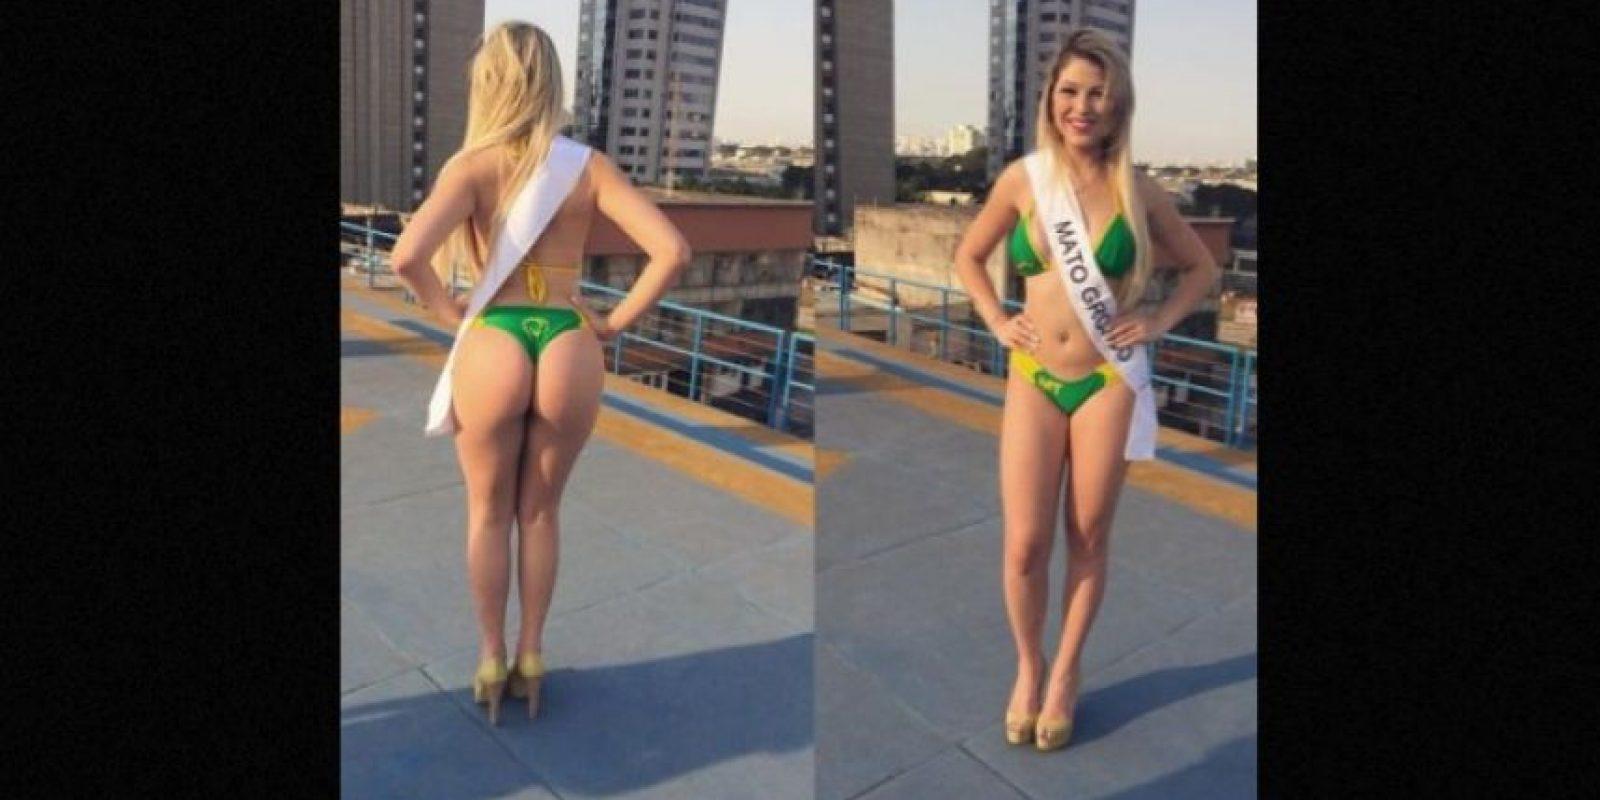 Fernanda Paulino representaba a Mato Grosso. Foto:Instagram/fernandapaulinooficial